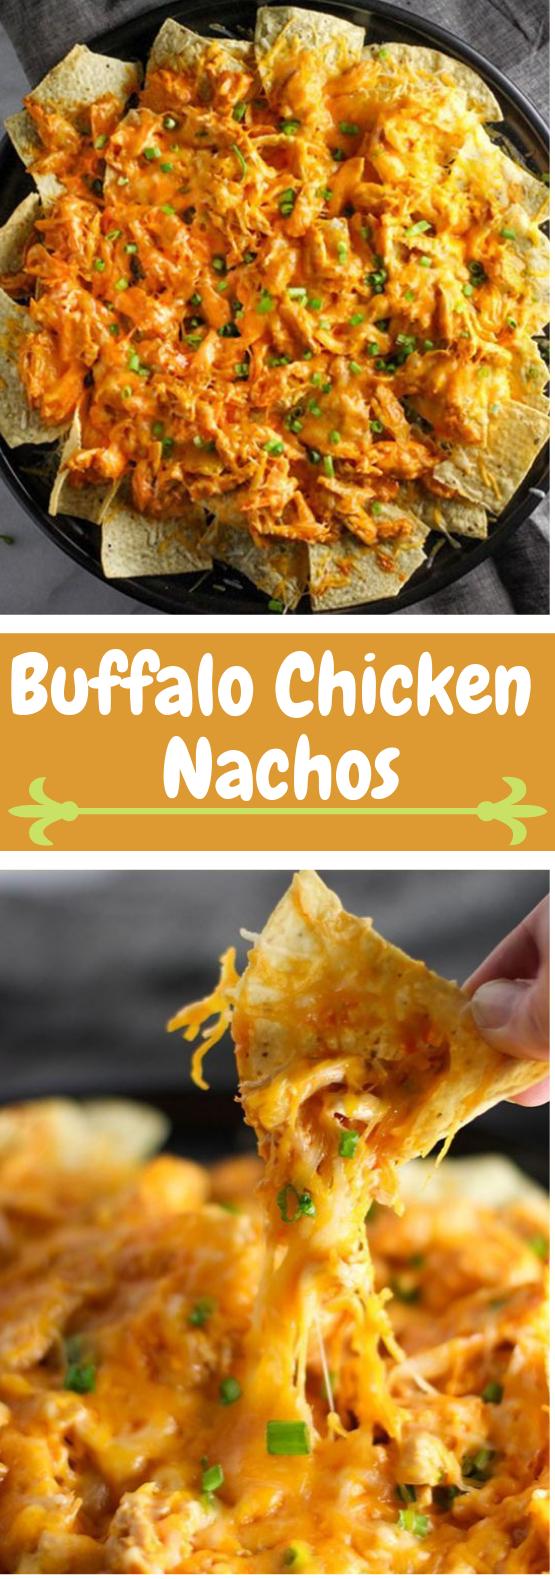 BUFFALO CHICKEN NACHOS #dinner #buffalo